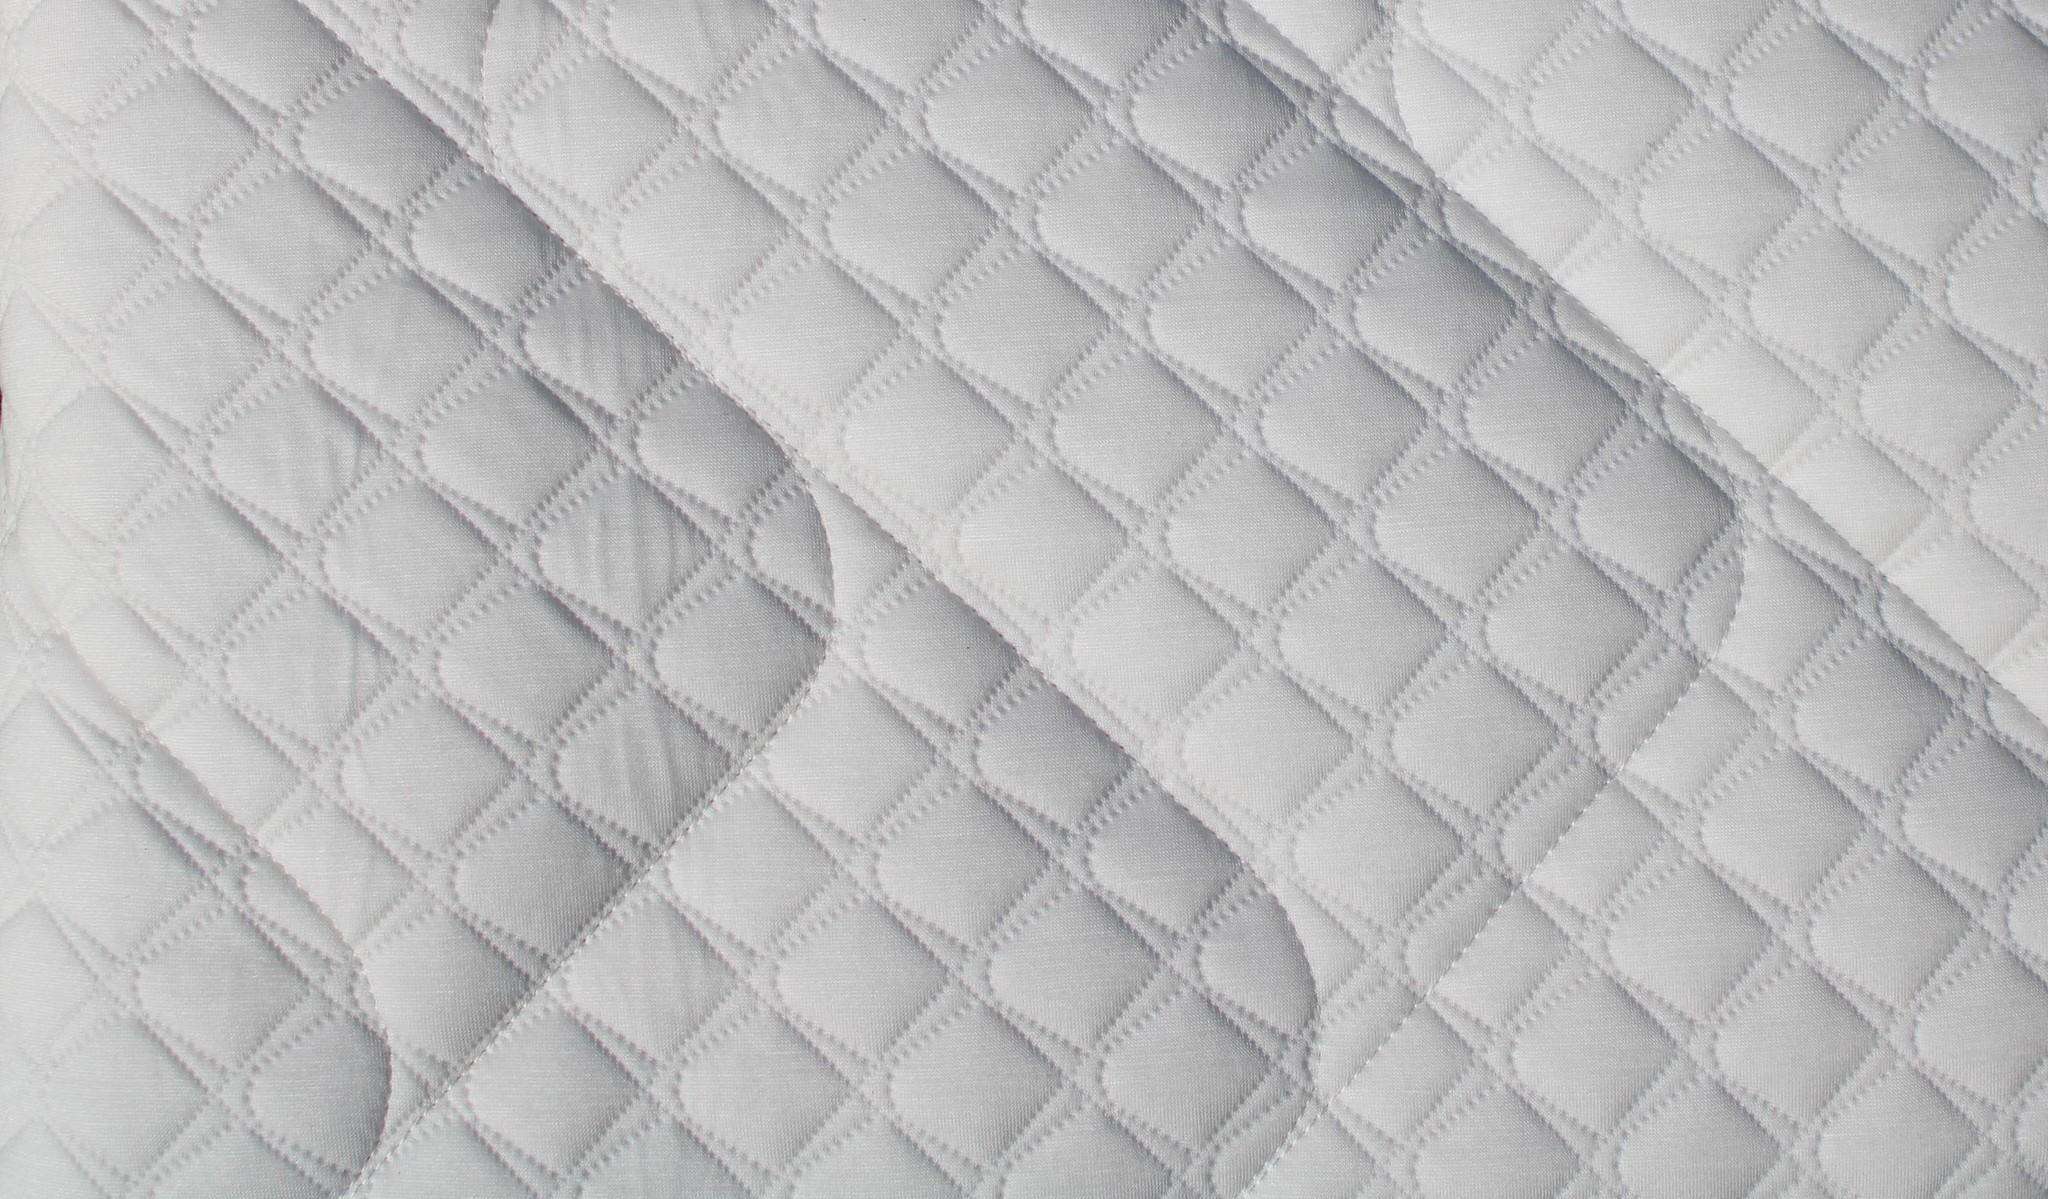 Sarpy Kindermatras 90x180 Sertel Tailor Made Mattress